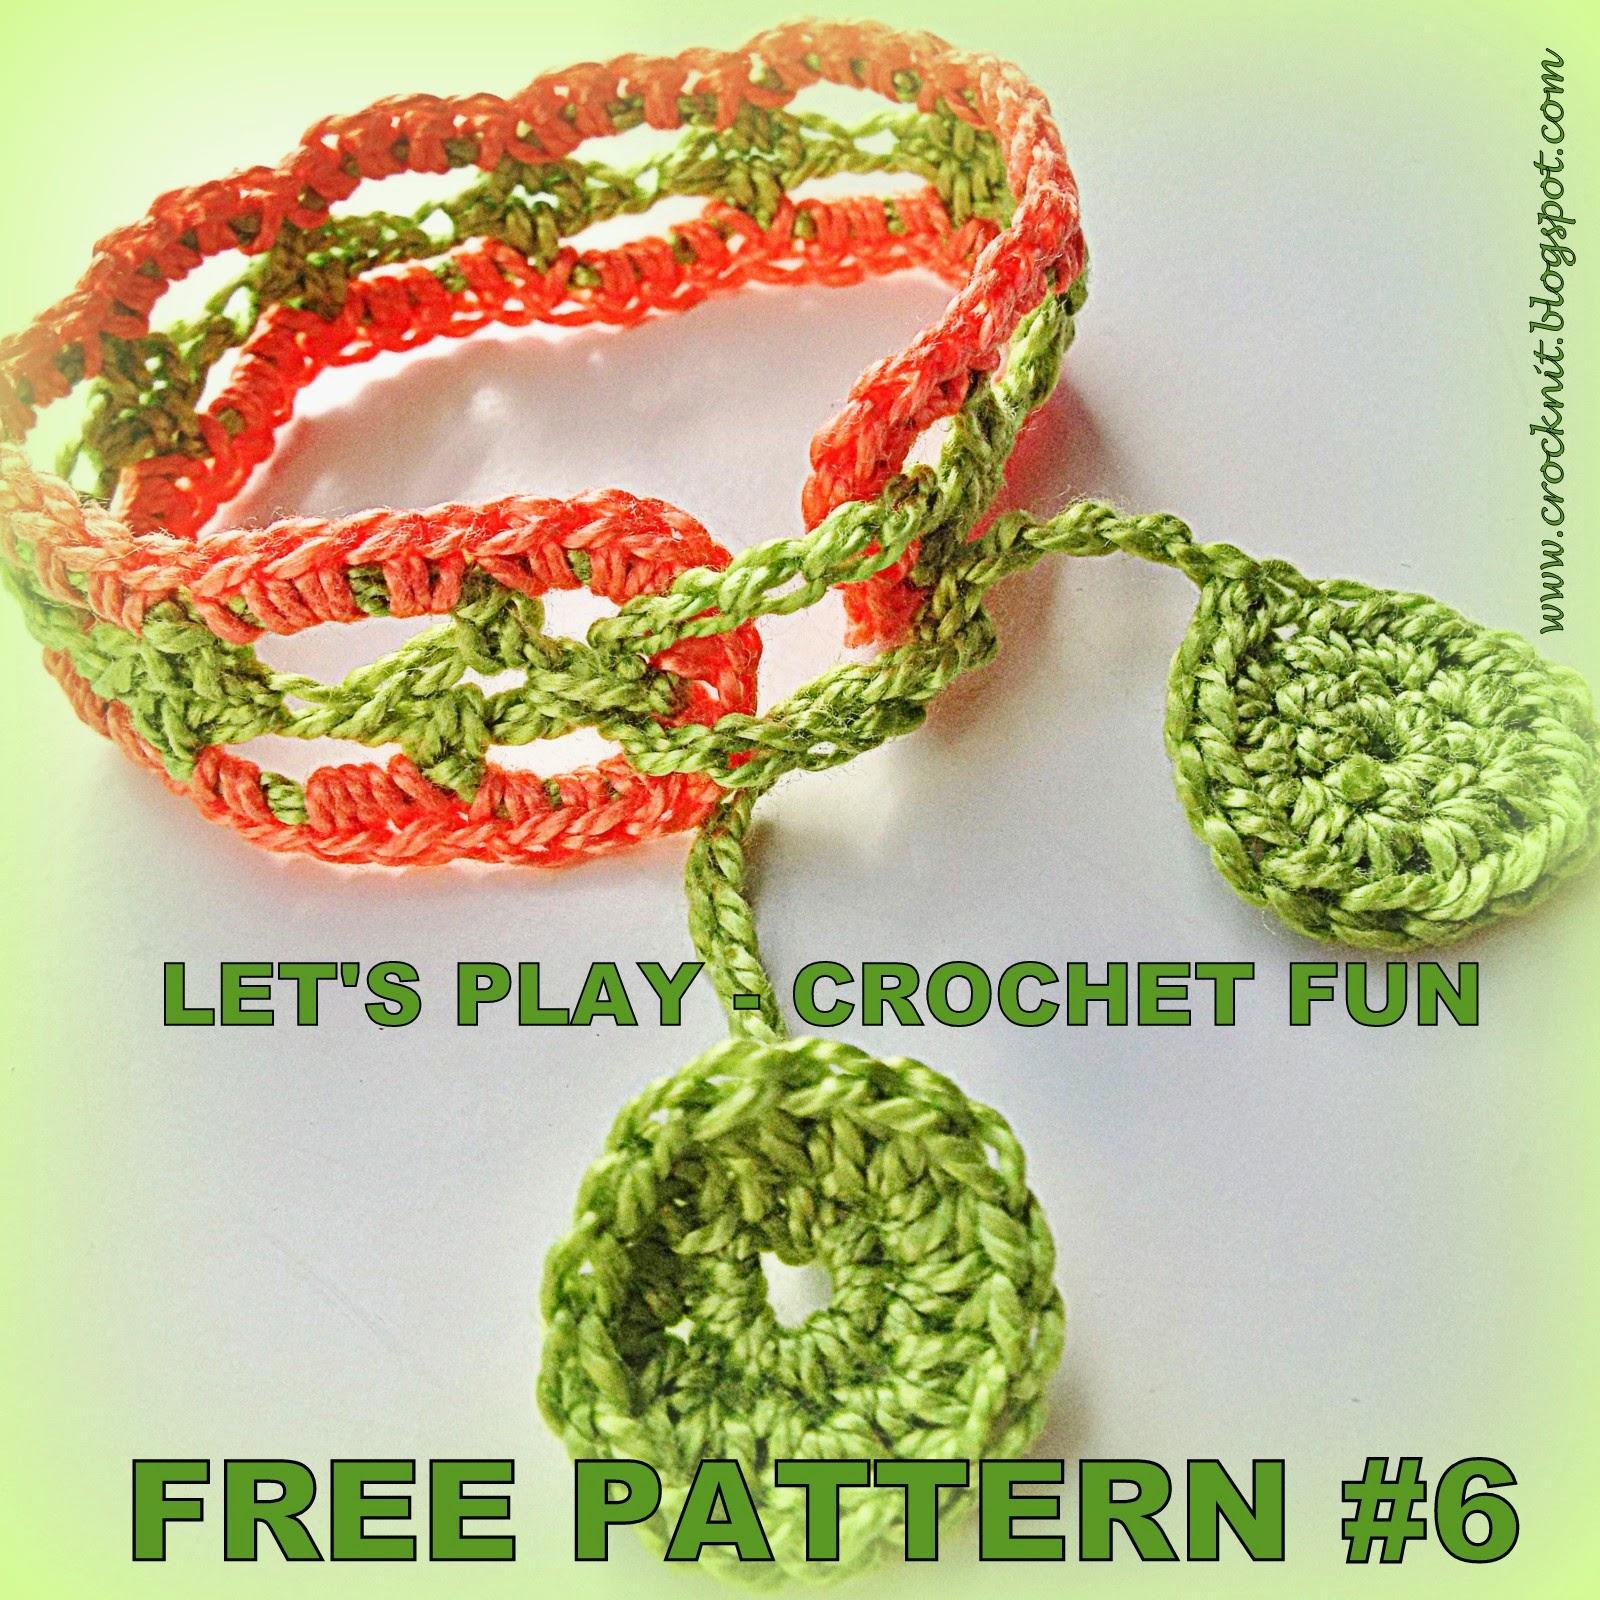 MICROCKNIT CREATIONS: LET\'S PLAY - CROCHET FUN - FREE PATTERN #6